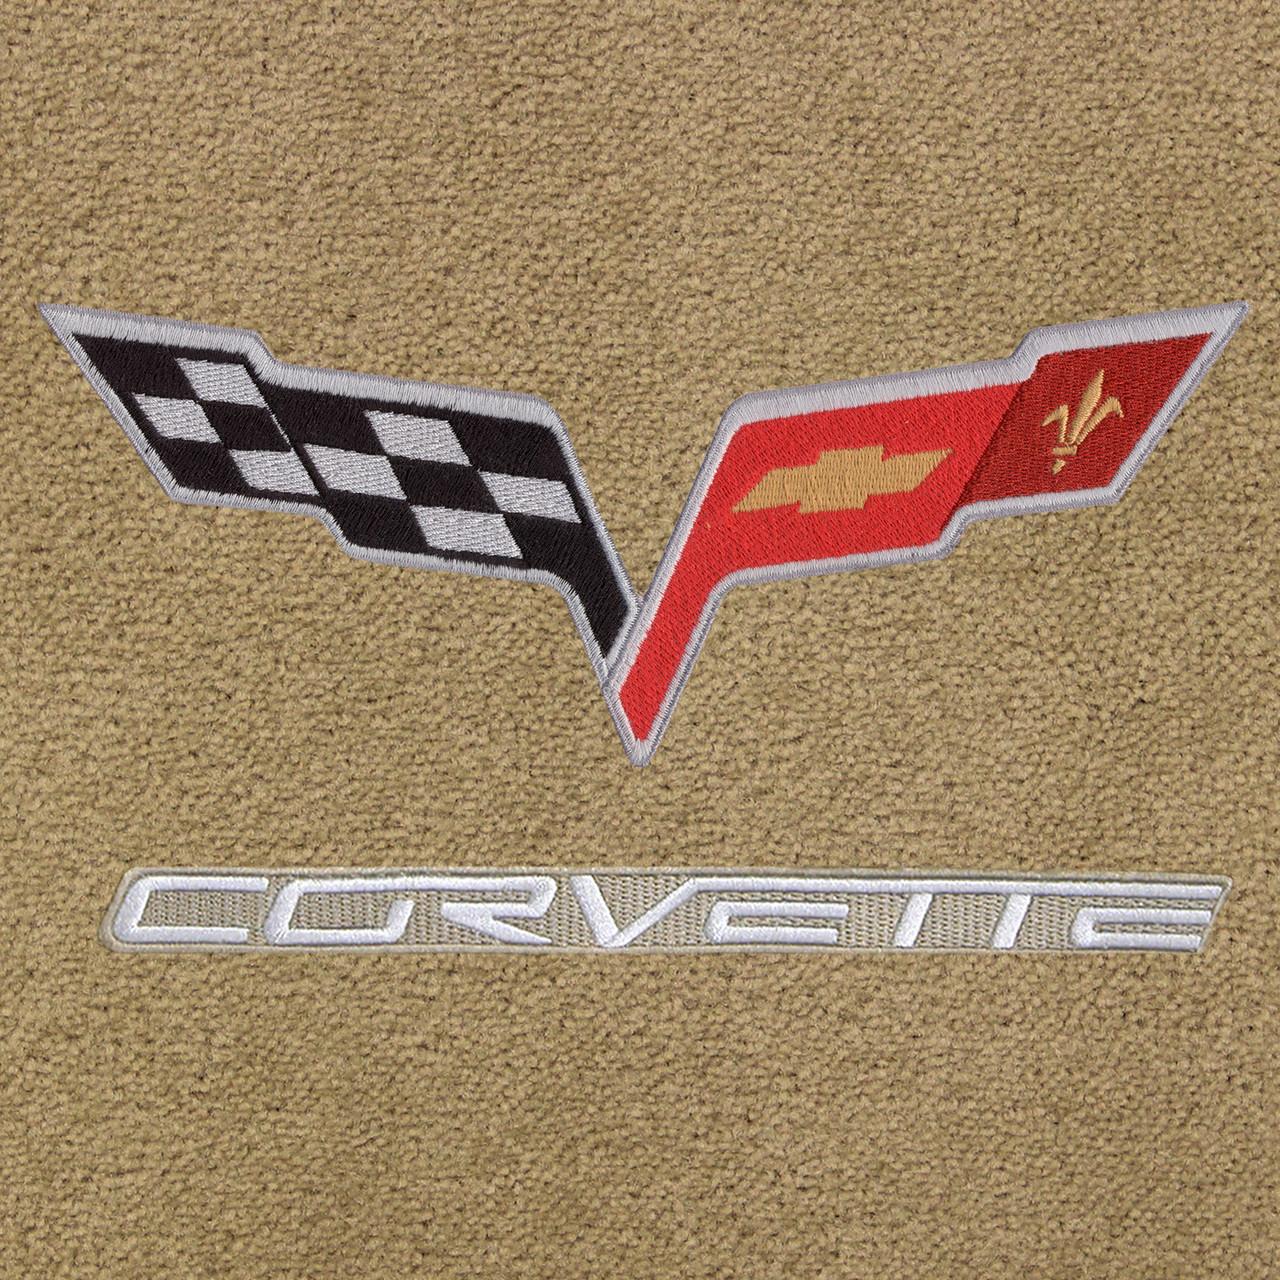 C6 Logo, Silver Lettering, Beige Background